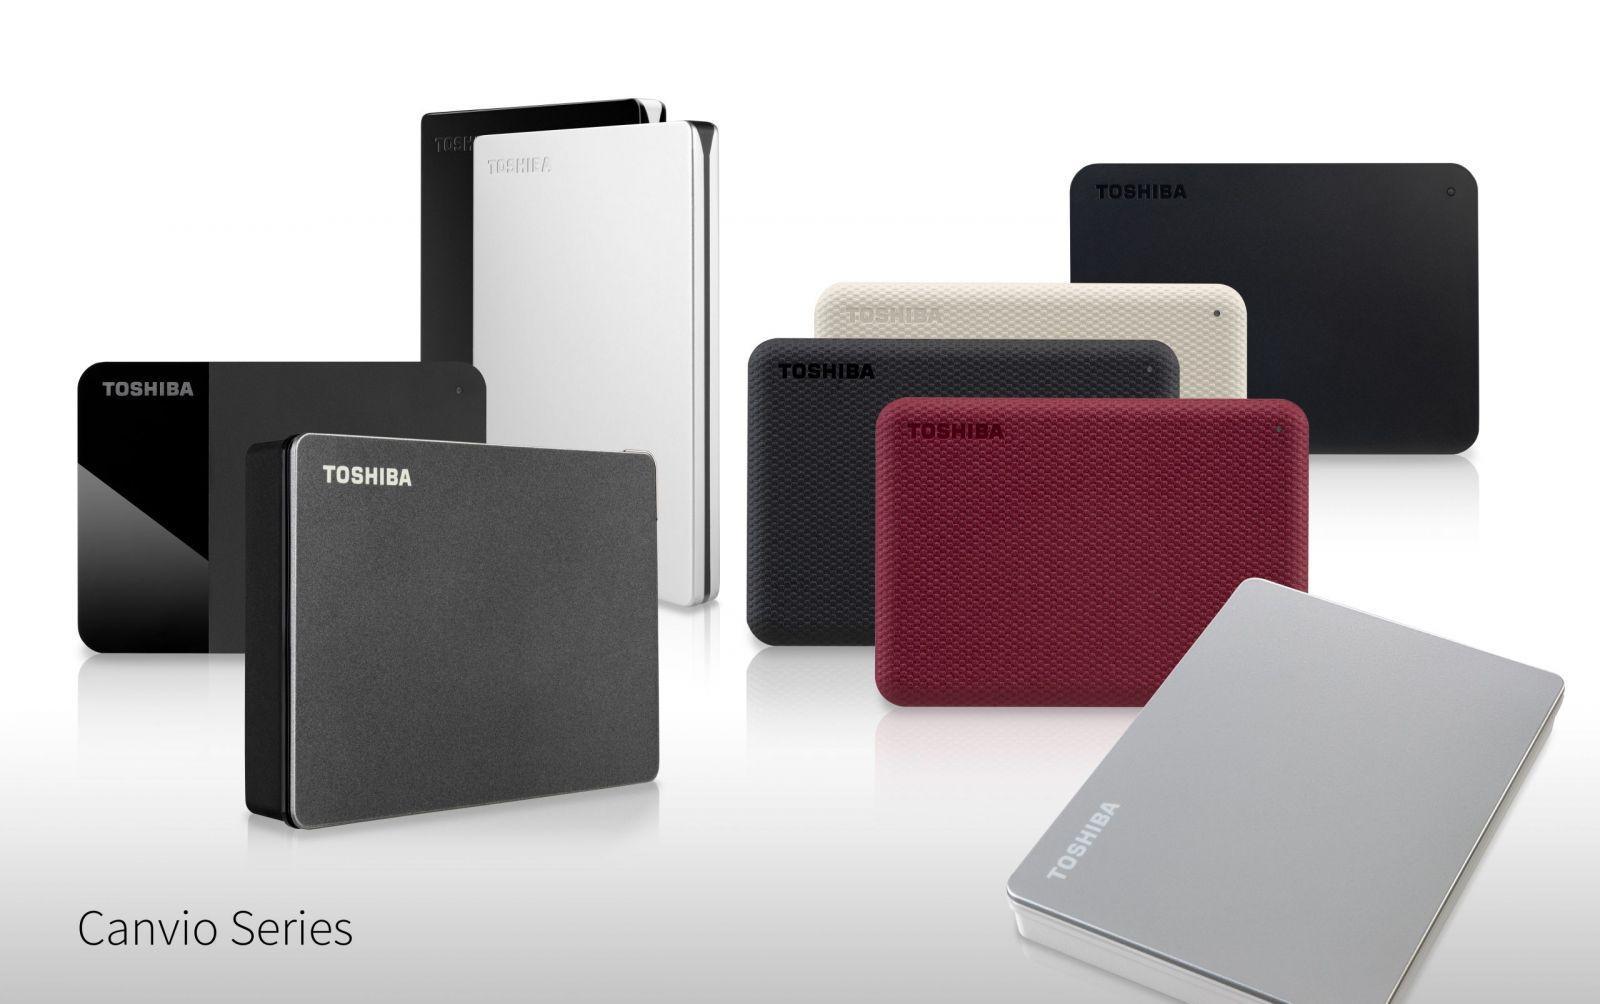 Toshiba представила два новых портативных накопителя (pressimage canvio2020 v2 scaled)